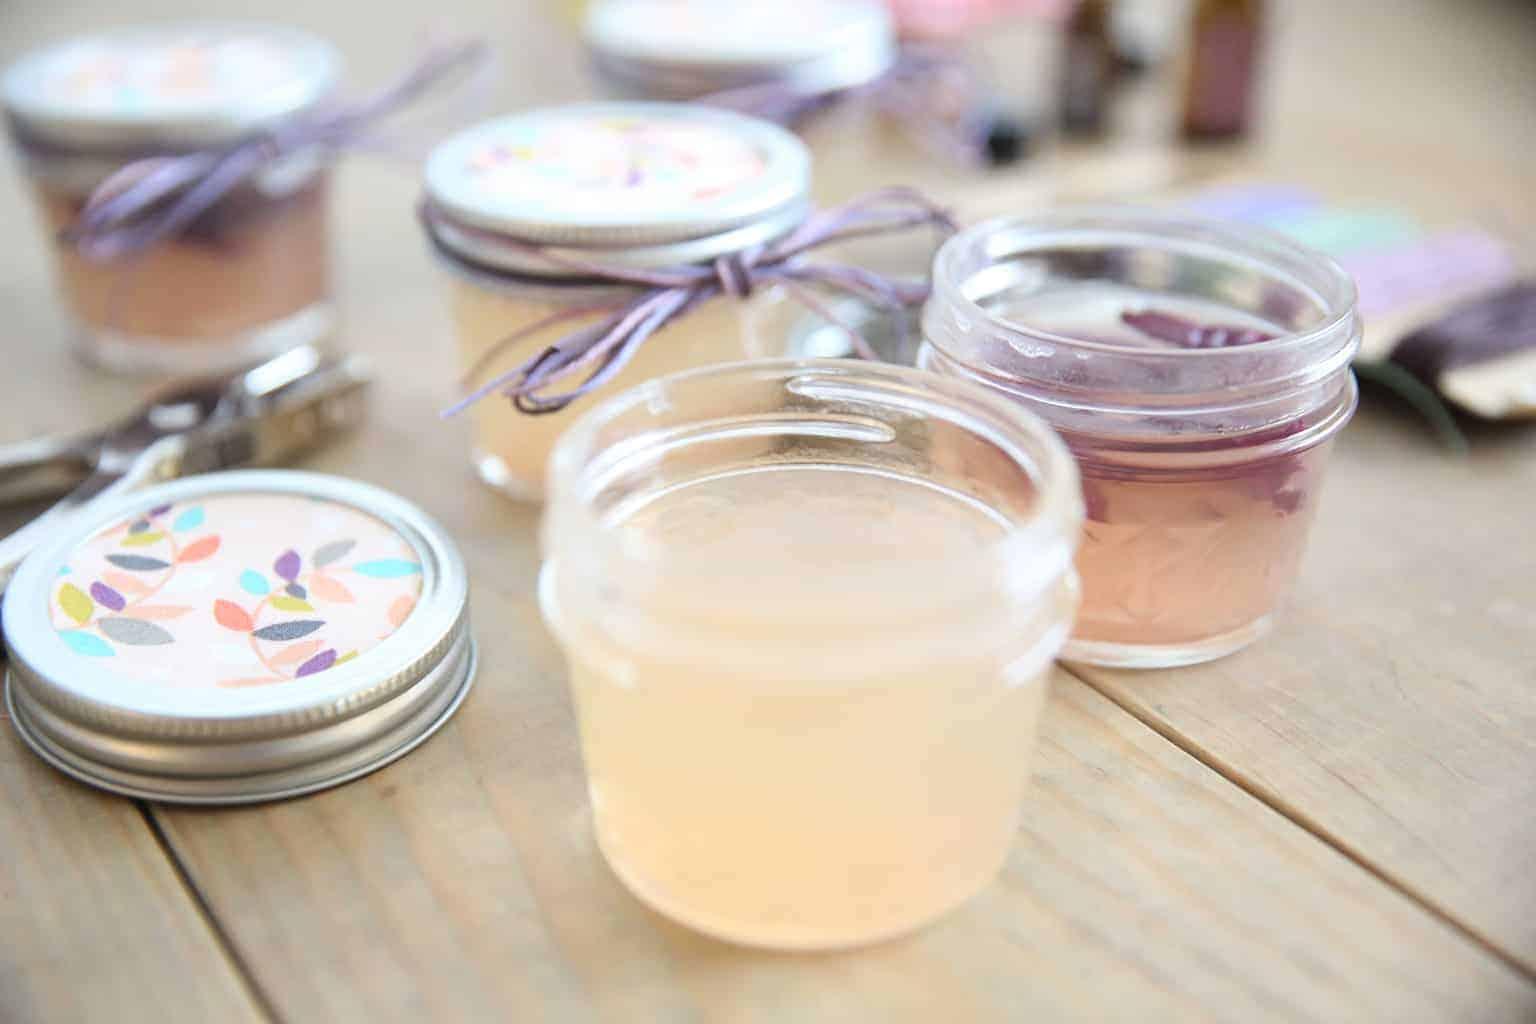 Toxic-free homemade gel air freshener.